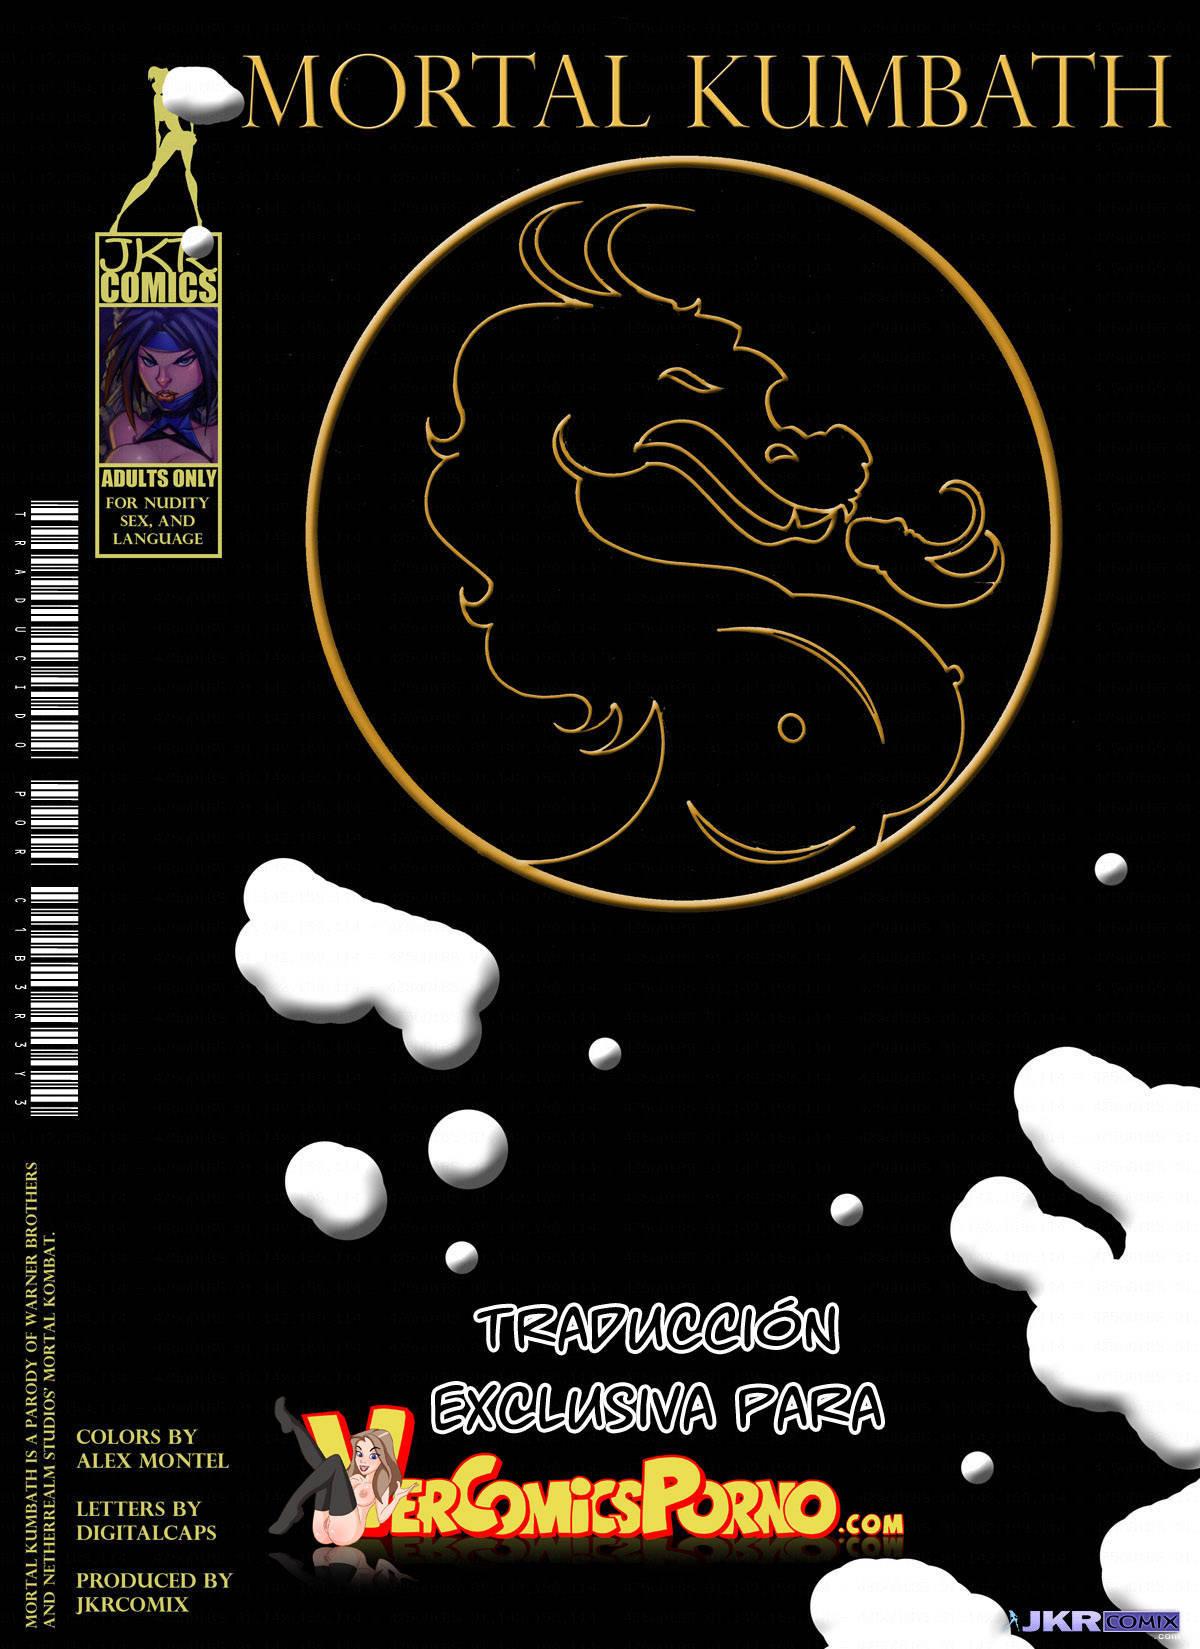 Americunt Dragon 2 Comic Porno mortal kumbath - comic porno - ver comic porno gratis | loto